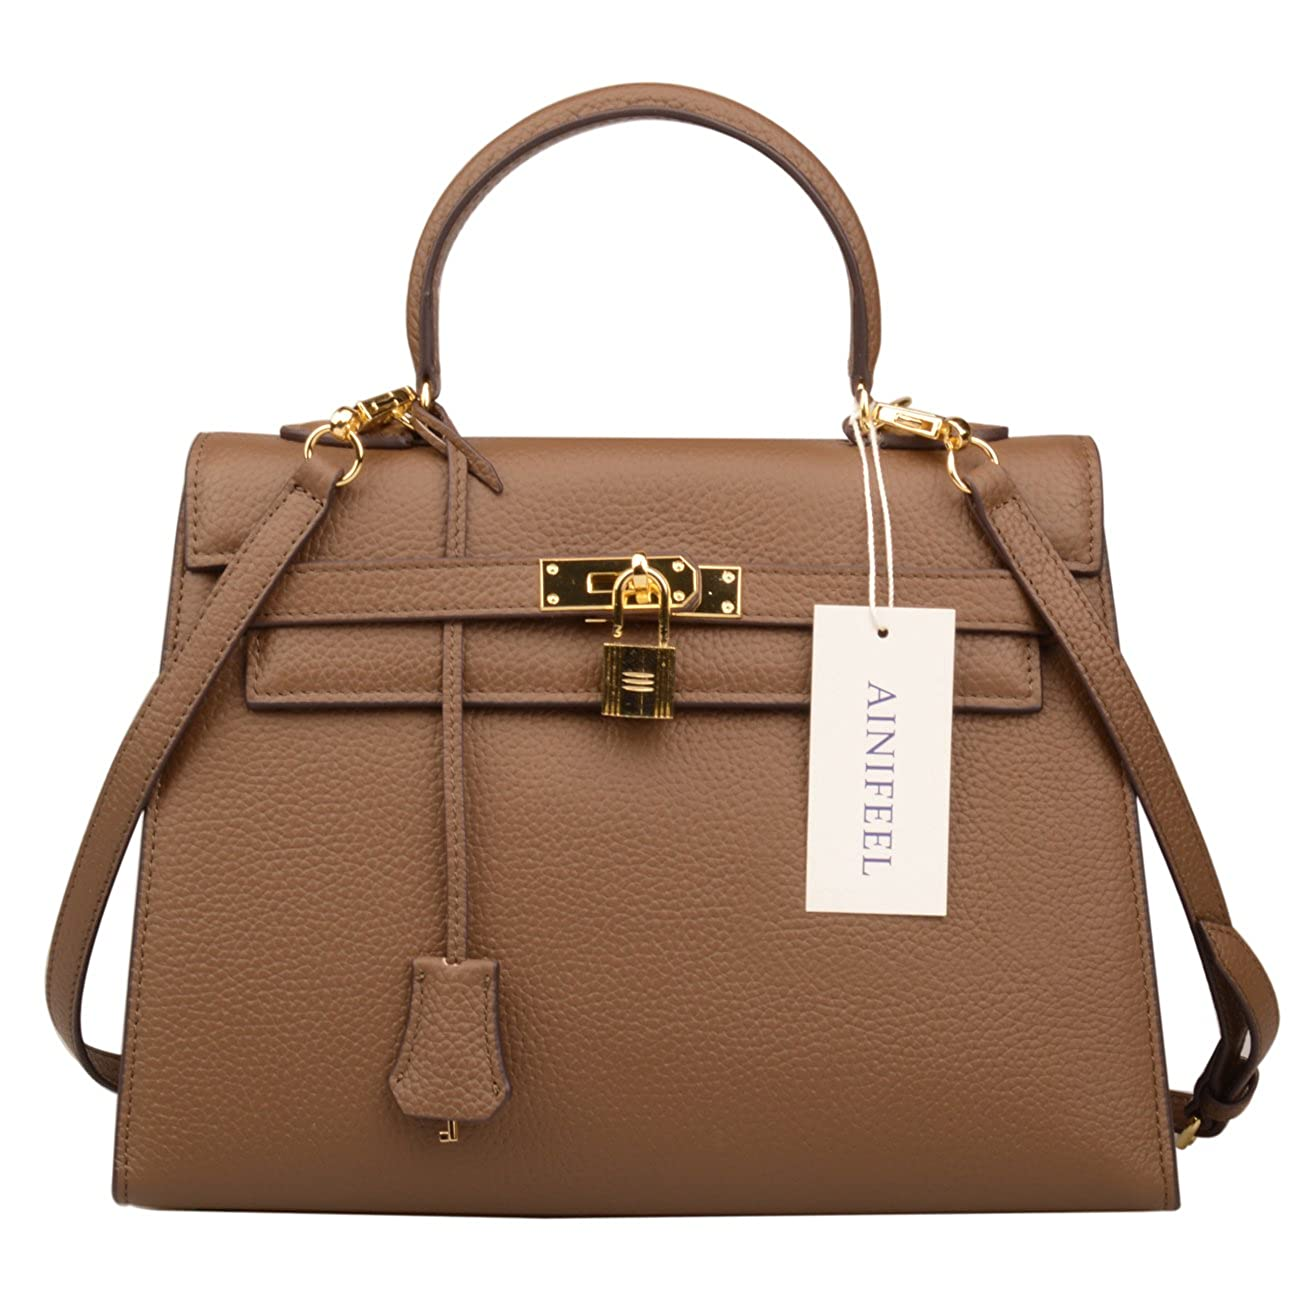 429cfc1cd0d213 Ainifeel Women's Padlock 32cm Shoulder Handbags Satchel Purse Hobo Bag  (Khaki): Amazon.ca: Shoes & Handbags